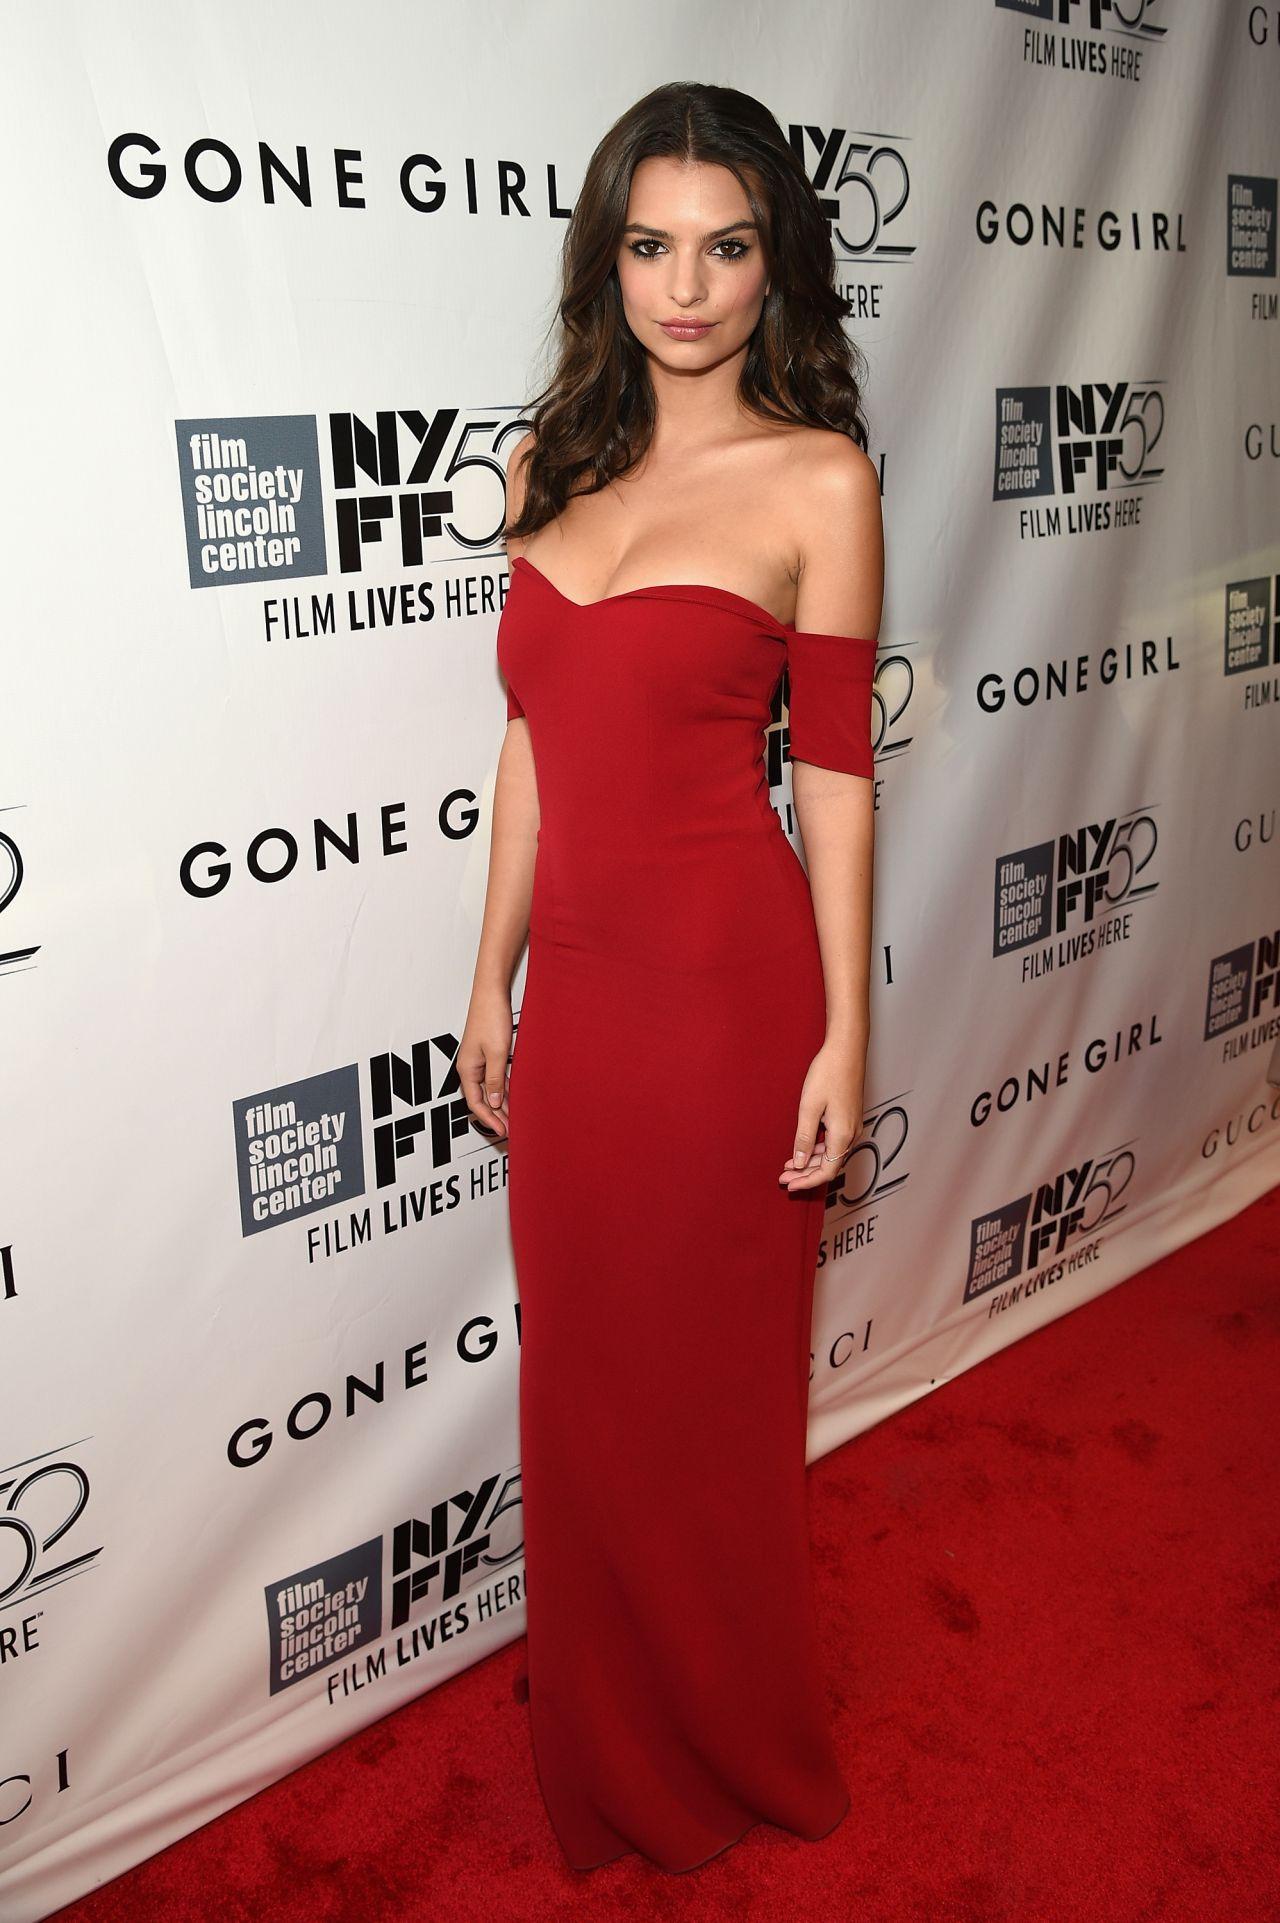 Emily Ratajkowski Gone Girl Premiere In New York